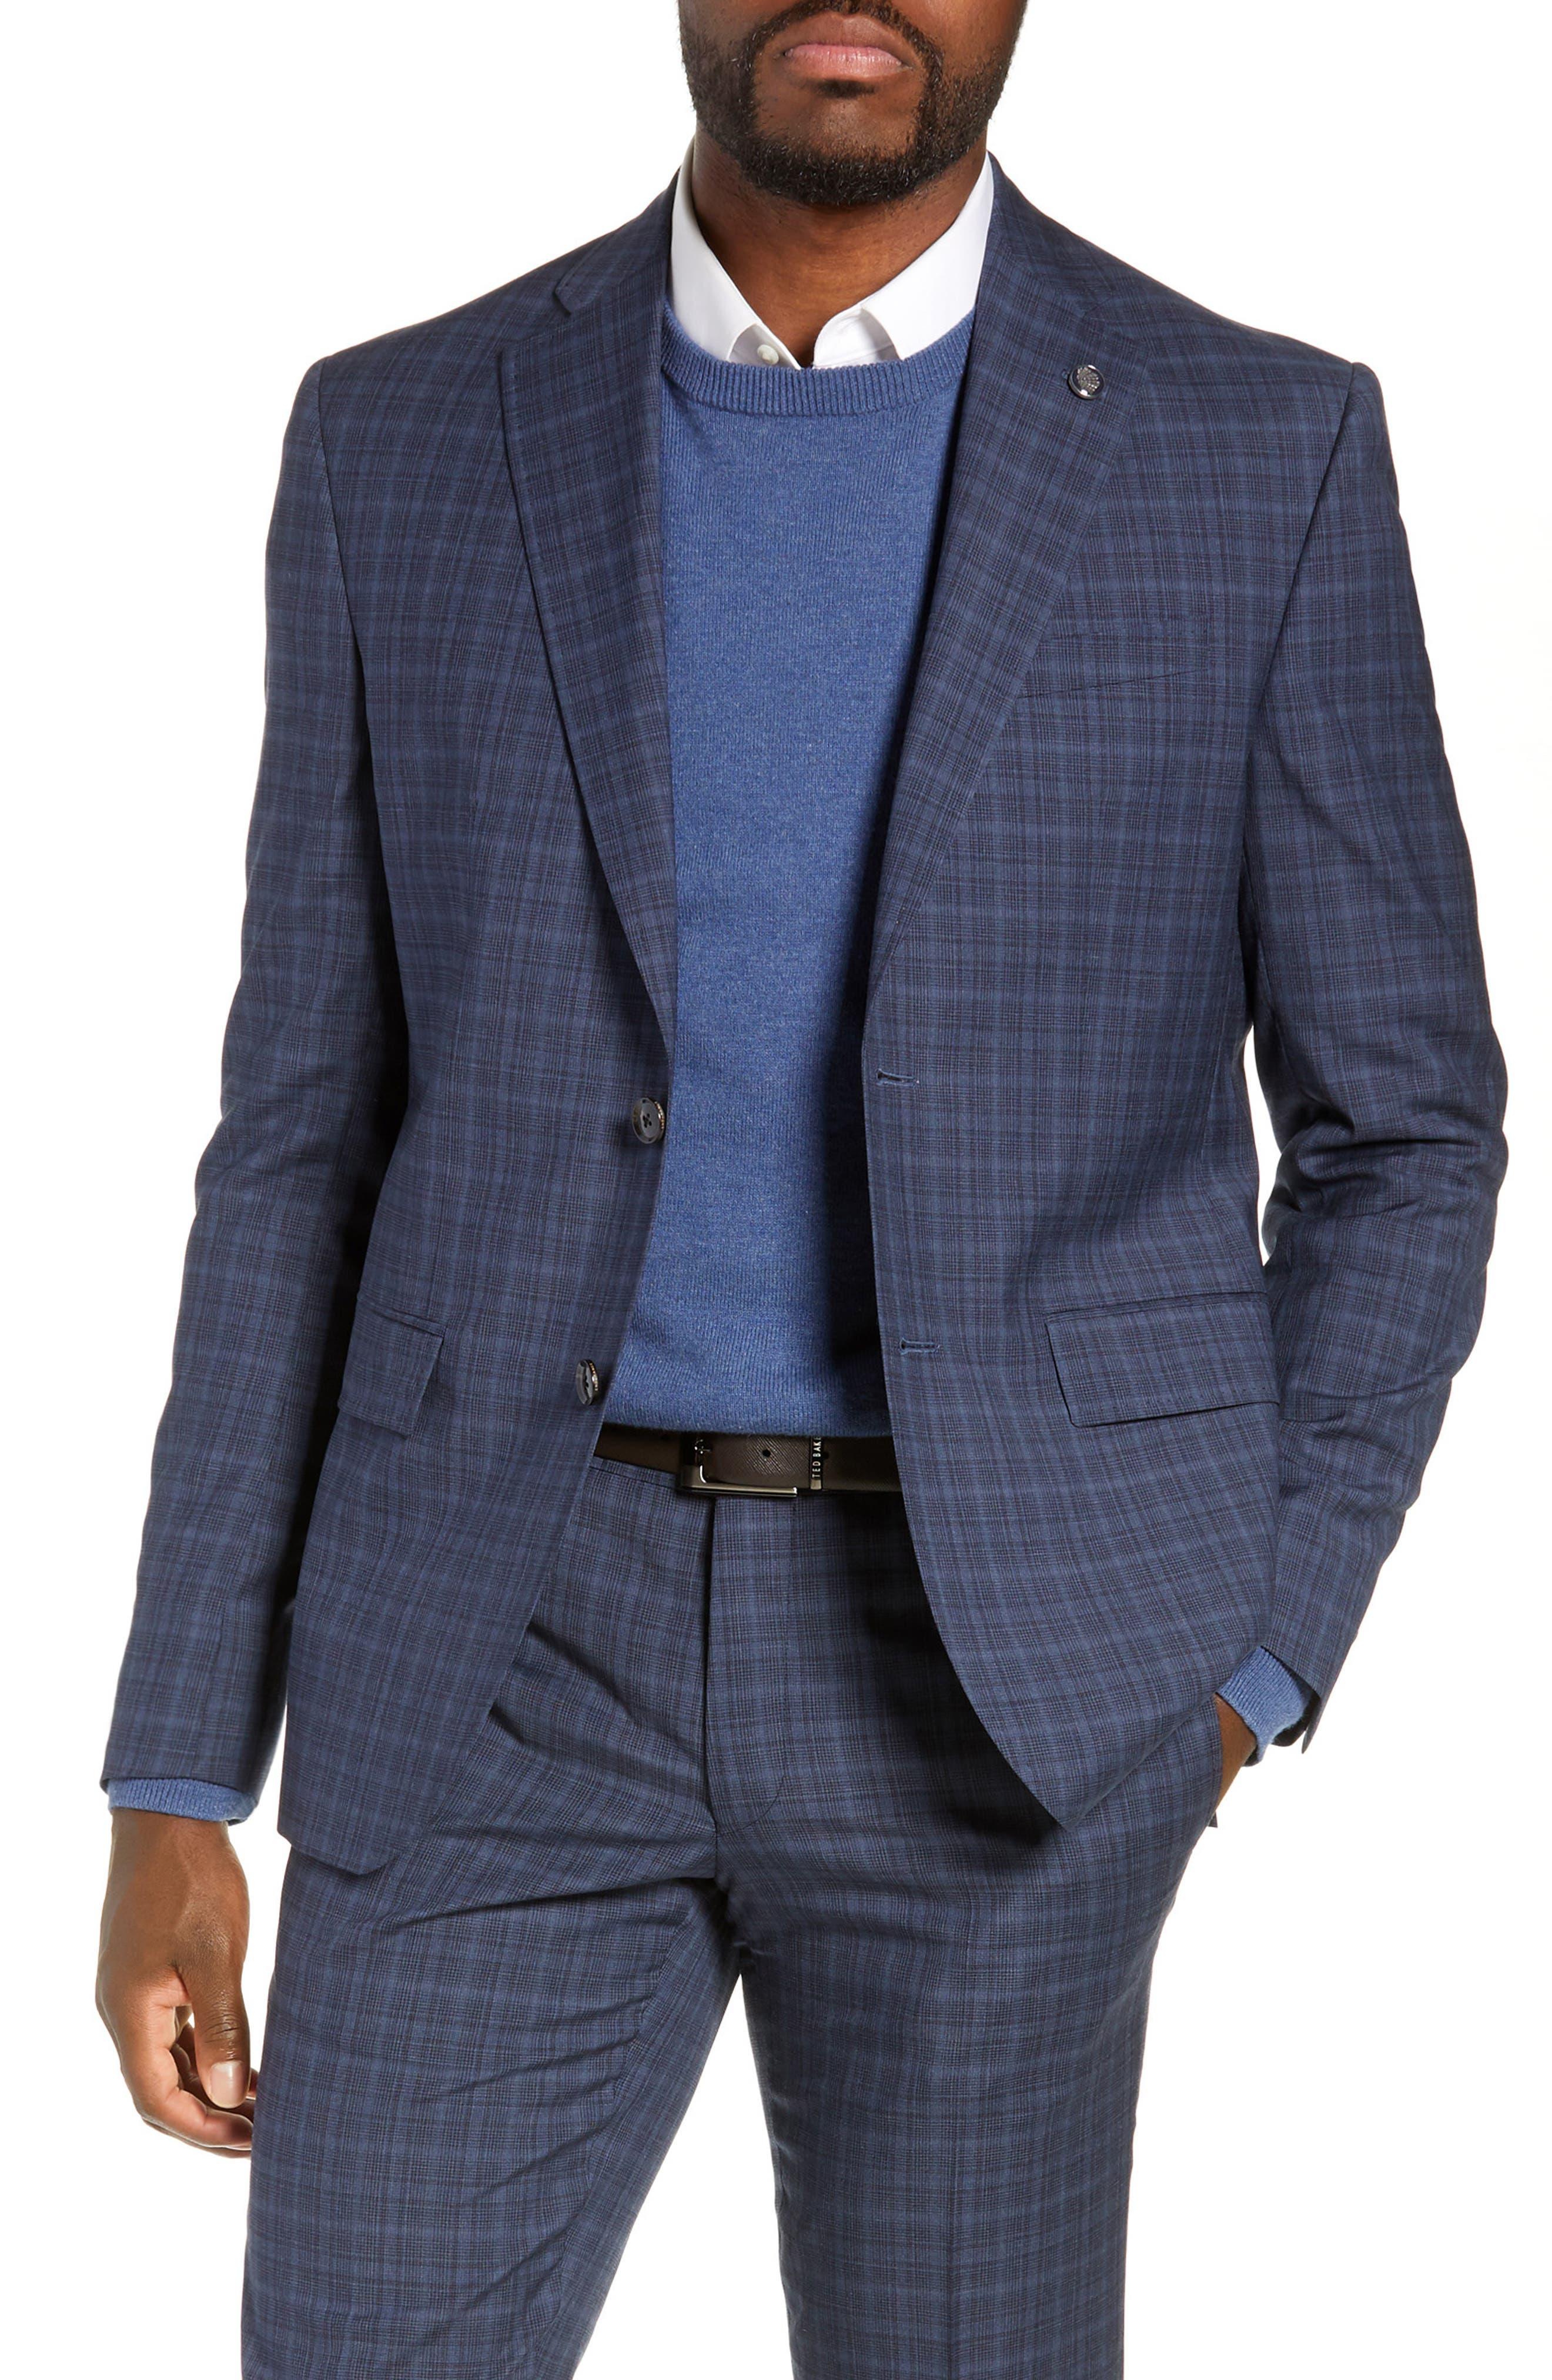 TED BAKER LONDON,                             Roger Slim Fit Plaid Wool Suit,                             Alternate thumbnail 5, color,                             GREY